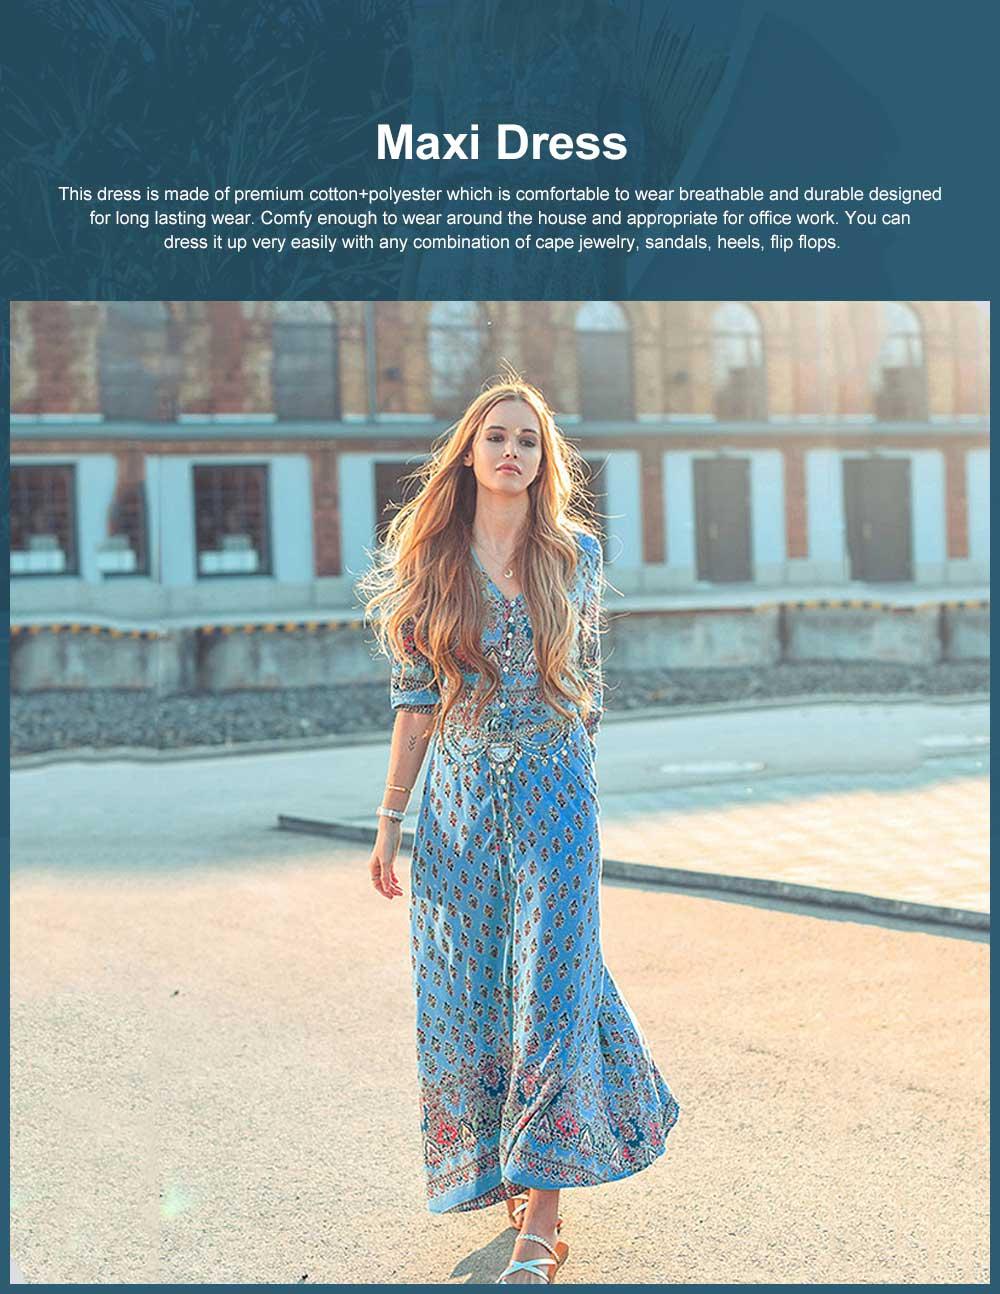 Women Floral Printed Maxi Dress, Deep V-neck Long Beach Dresses, Bohemian Side Split Dresses with Buttons 0